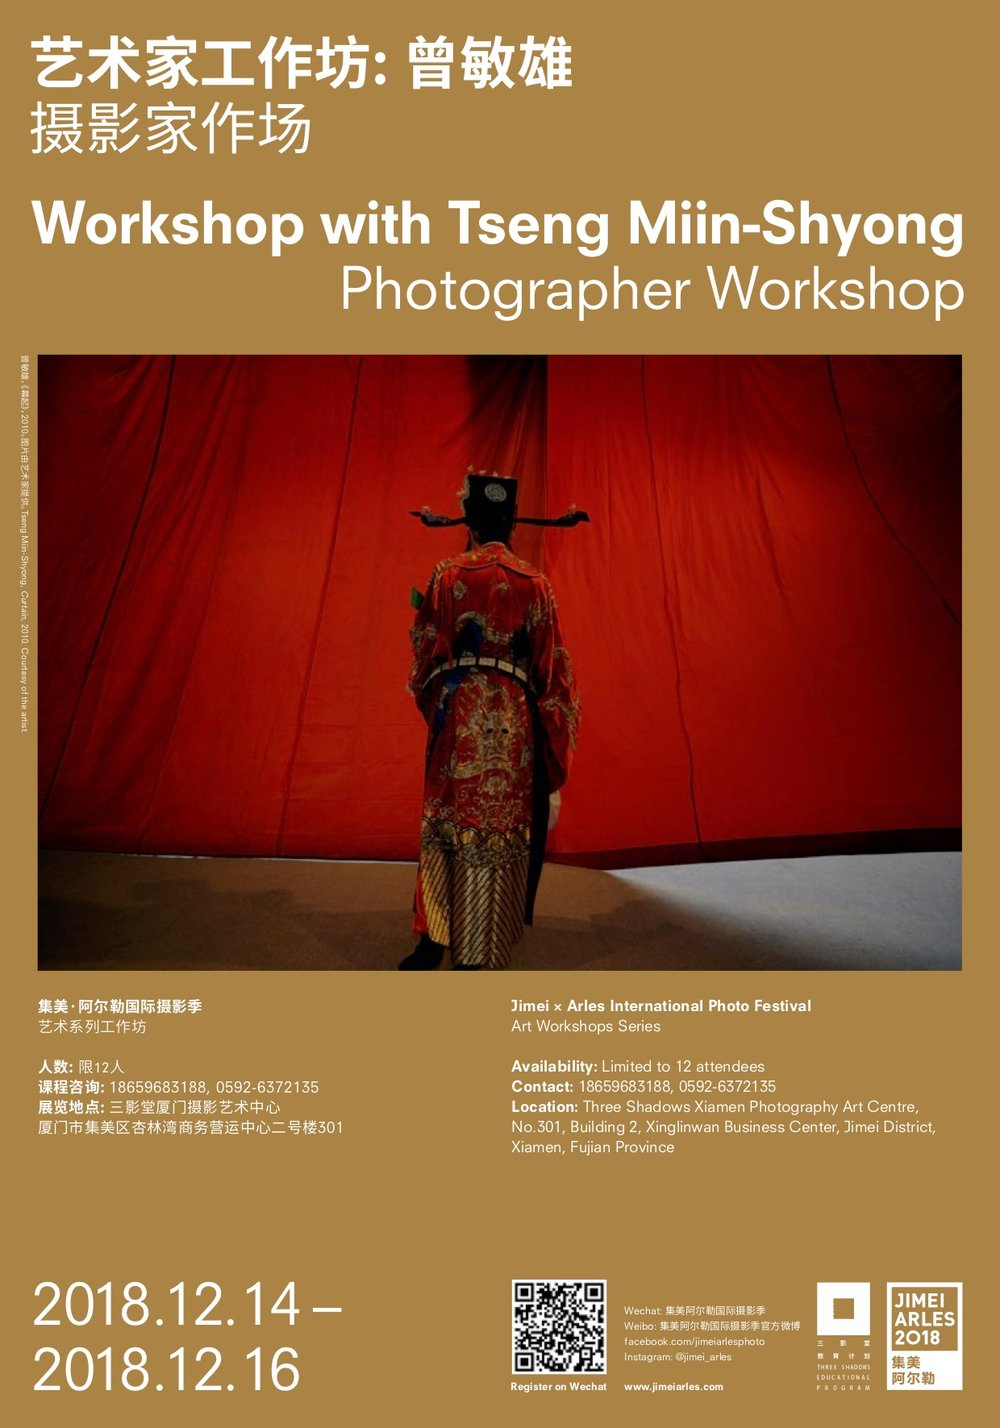 JIMEIARLES_Workshop Poster_Digital_Tseng_Miin_Shyong.jpg